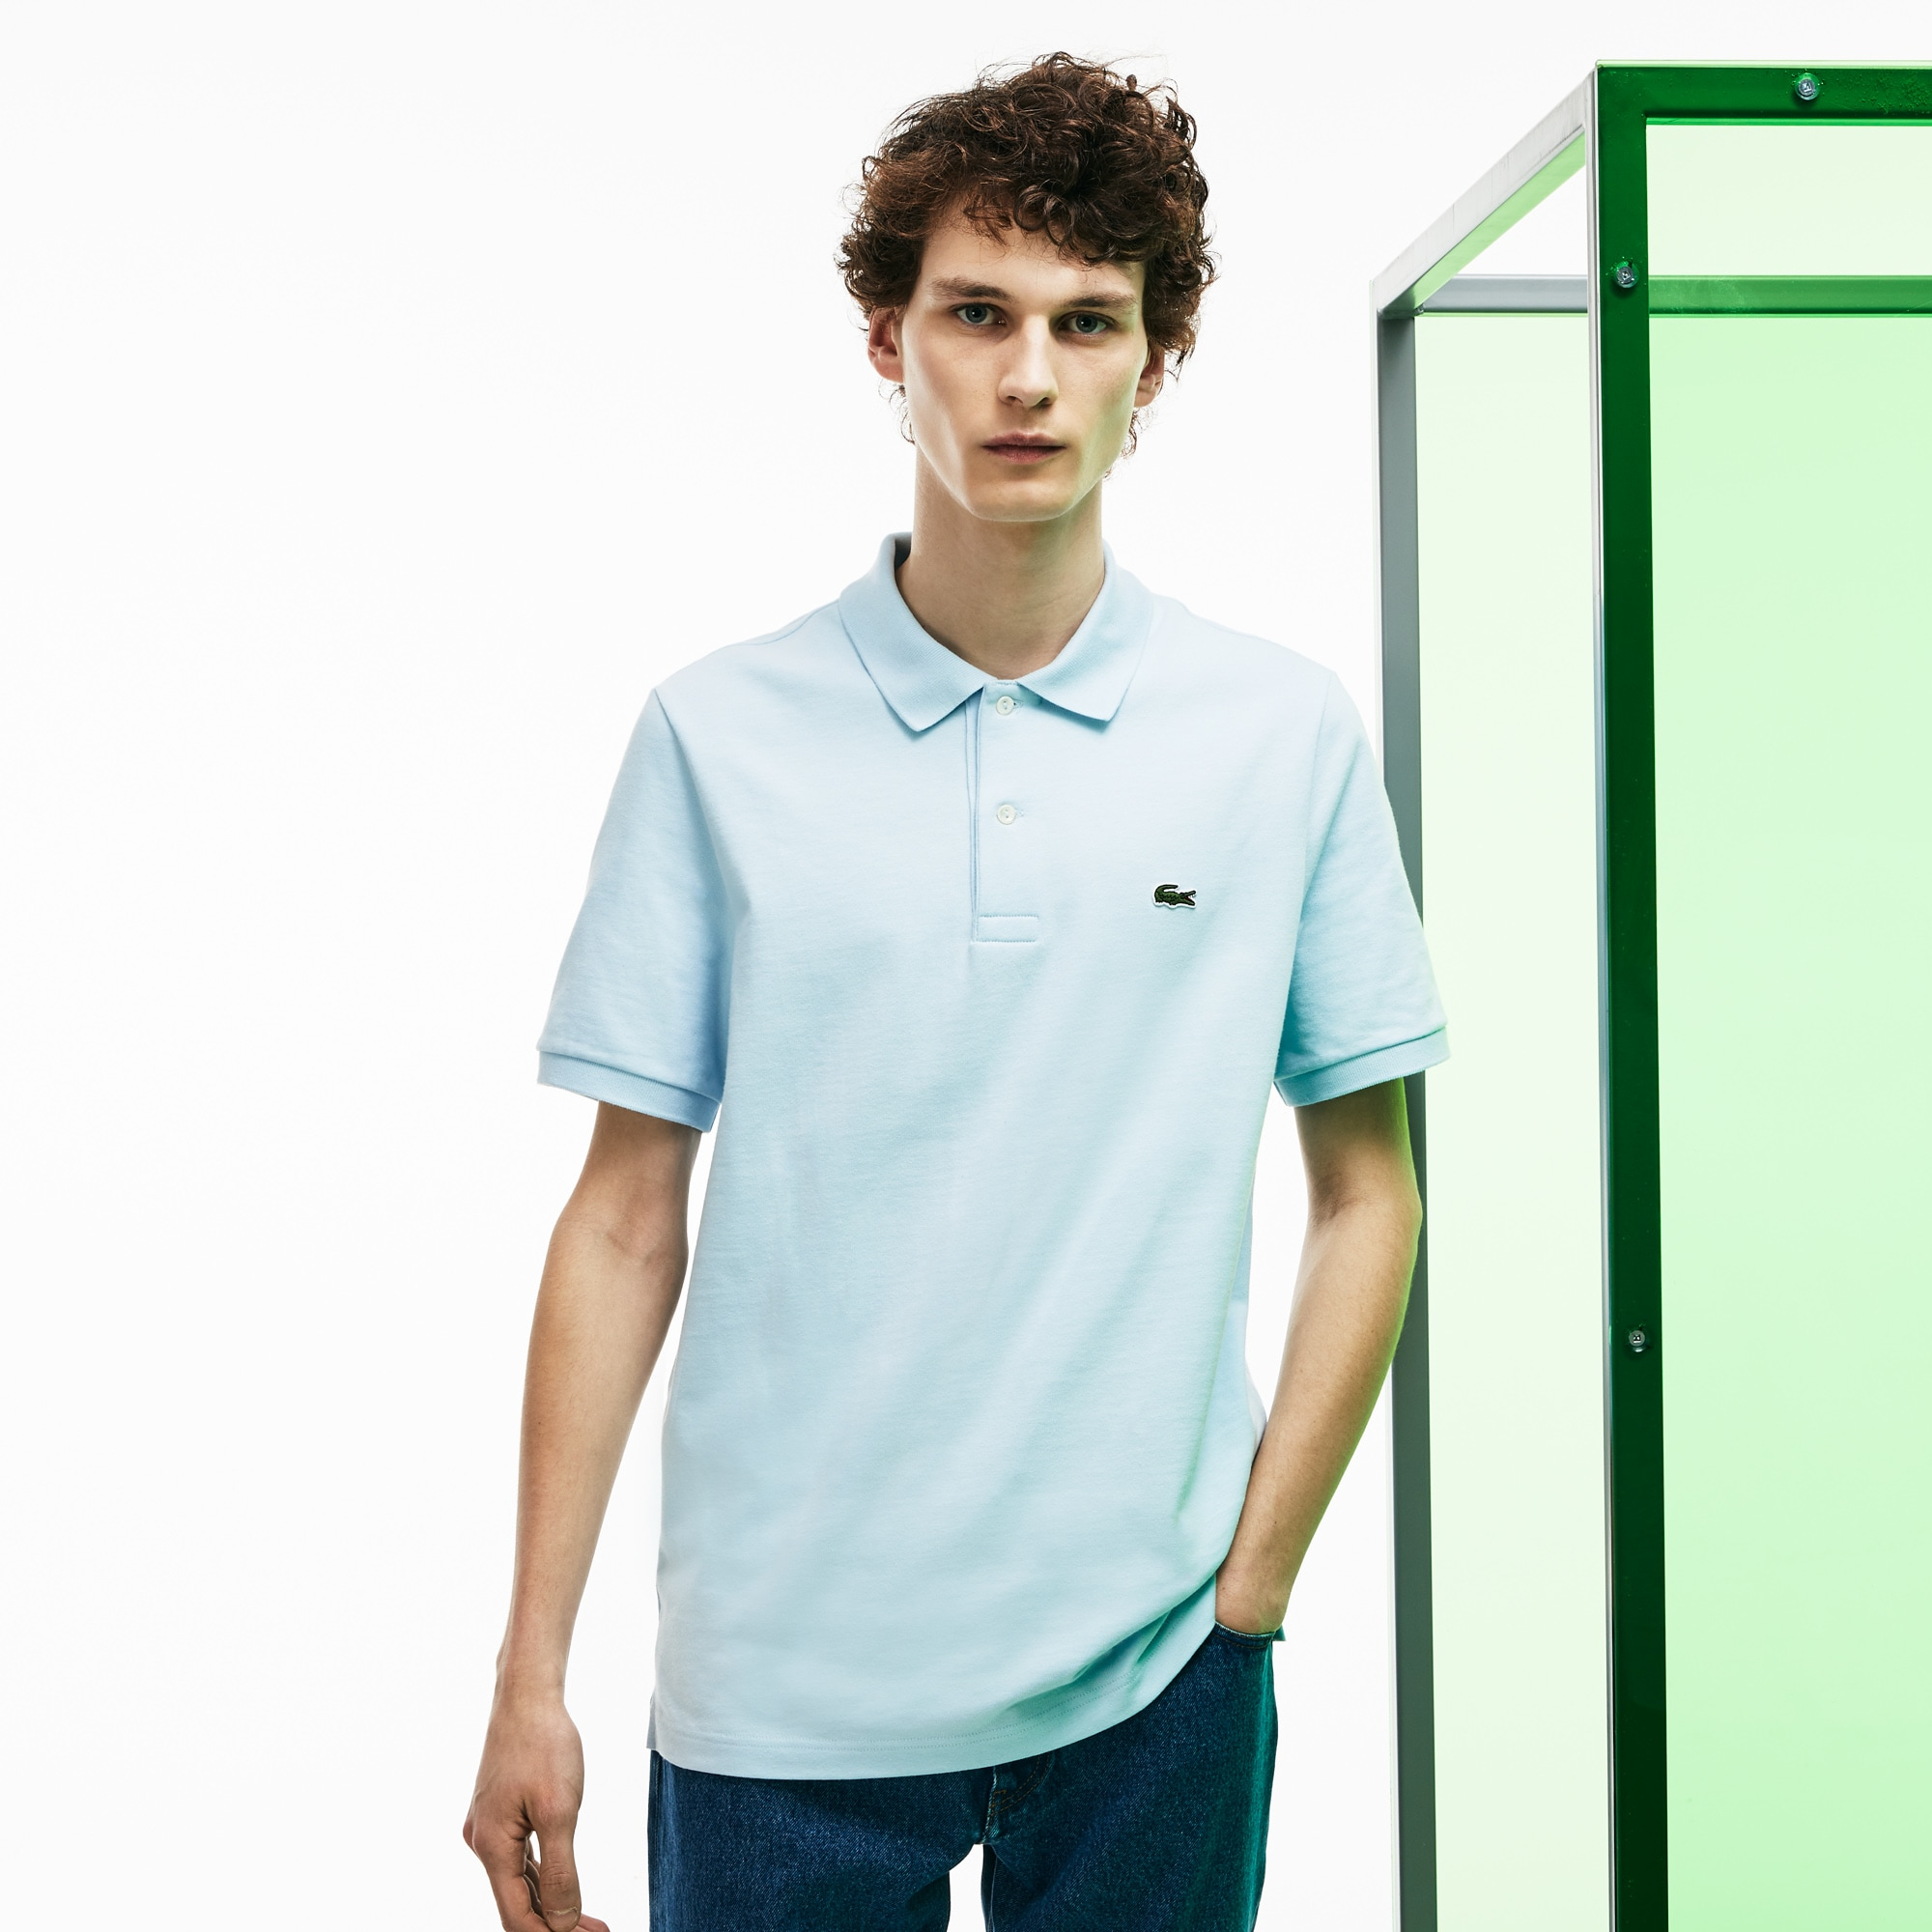 Men's Lacoste Fashion Show Thick Cotton Jersey Polo